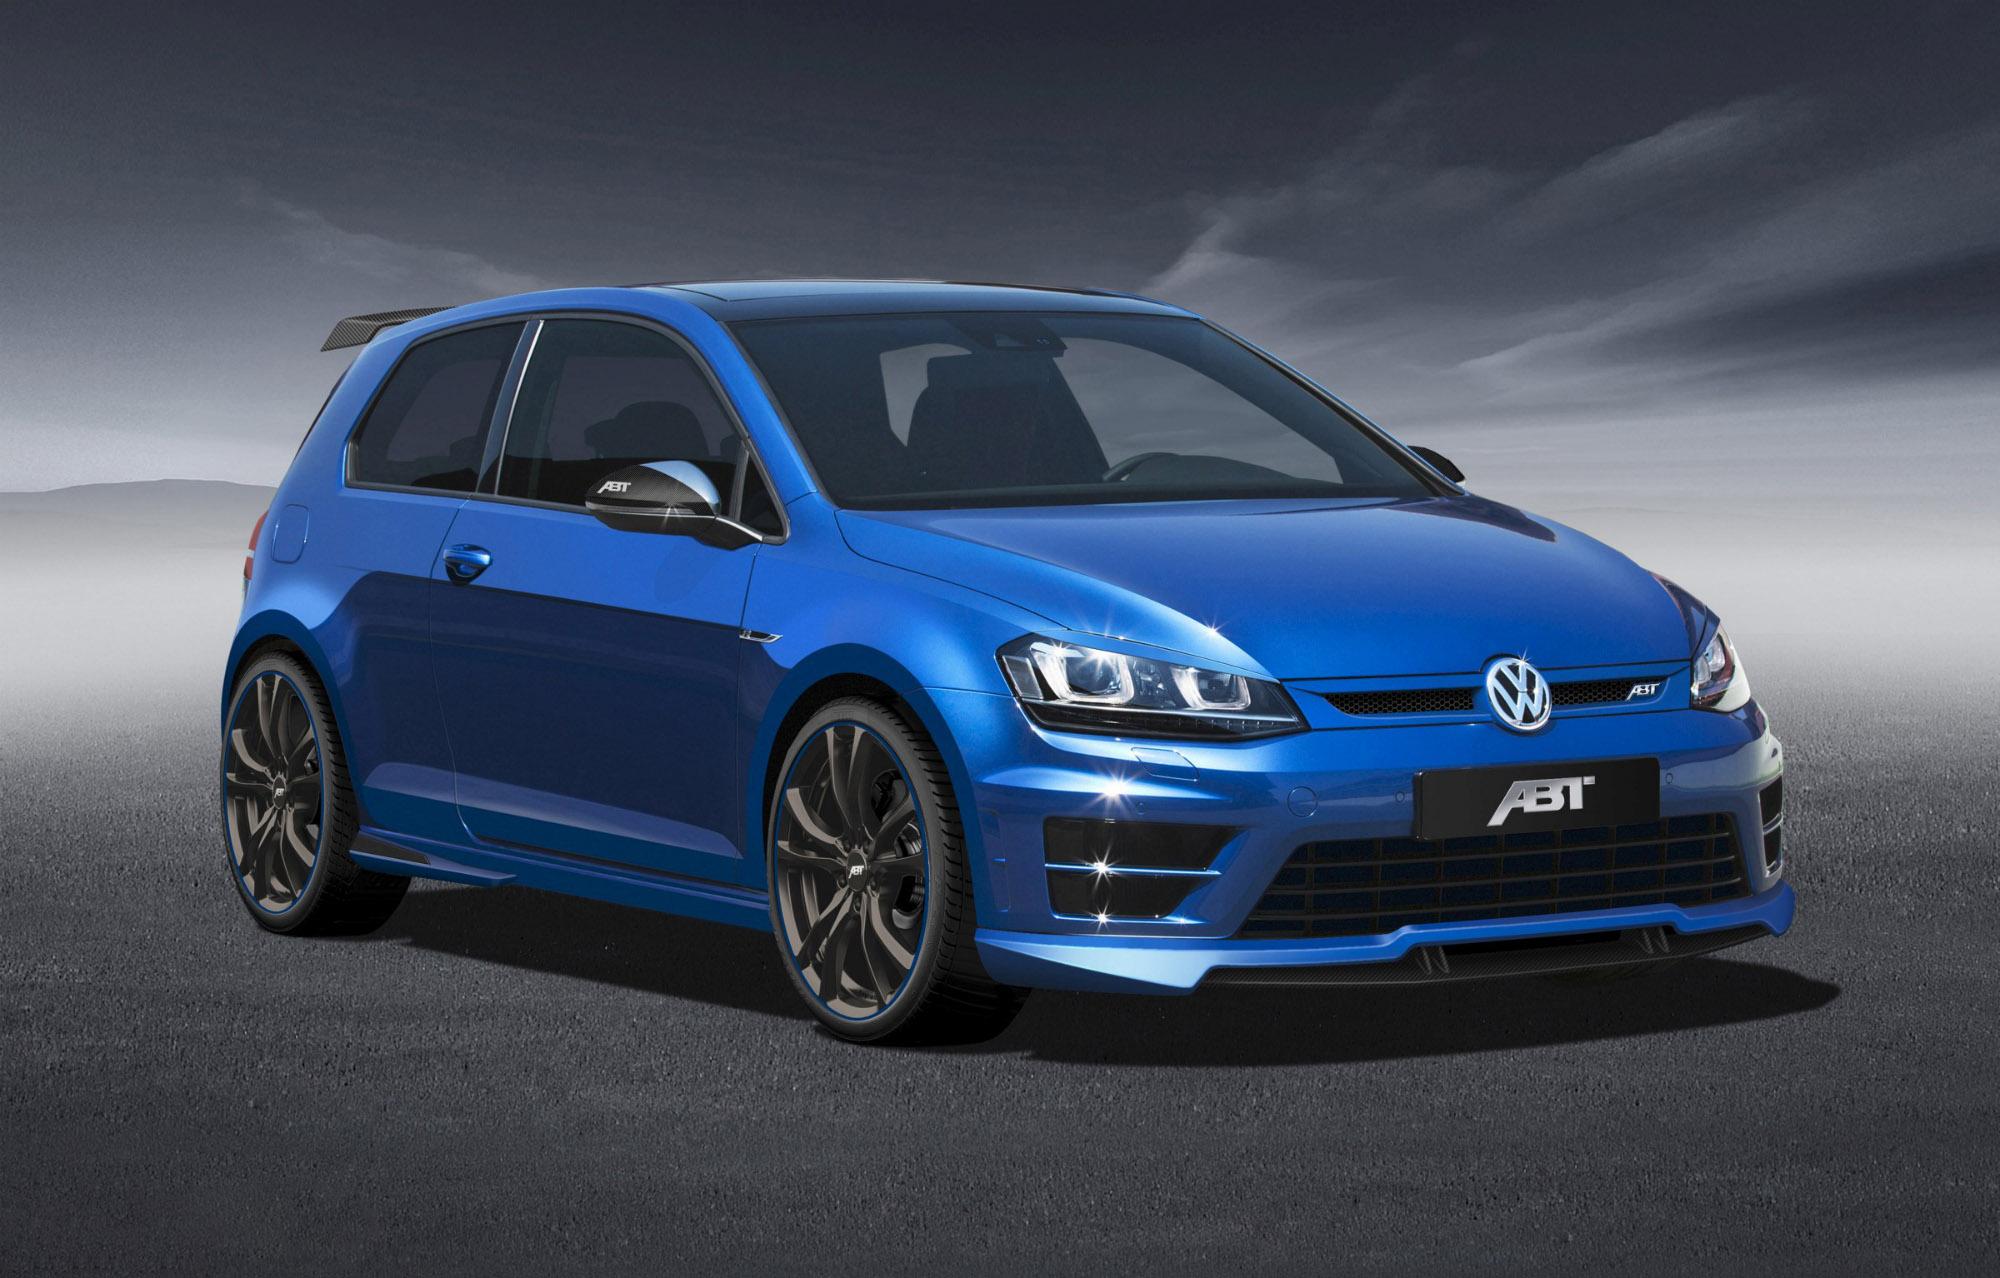 2015 ABT Volkswagen Golf VII R Wallpaper 2000x1278